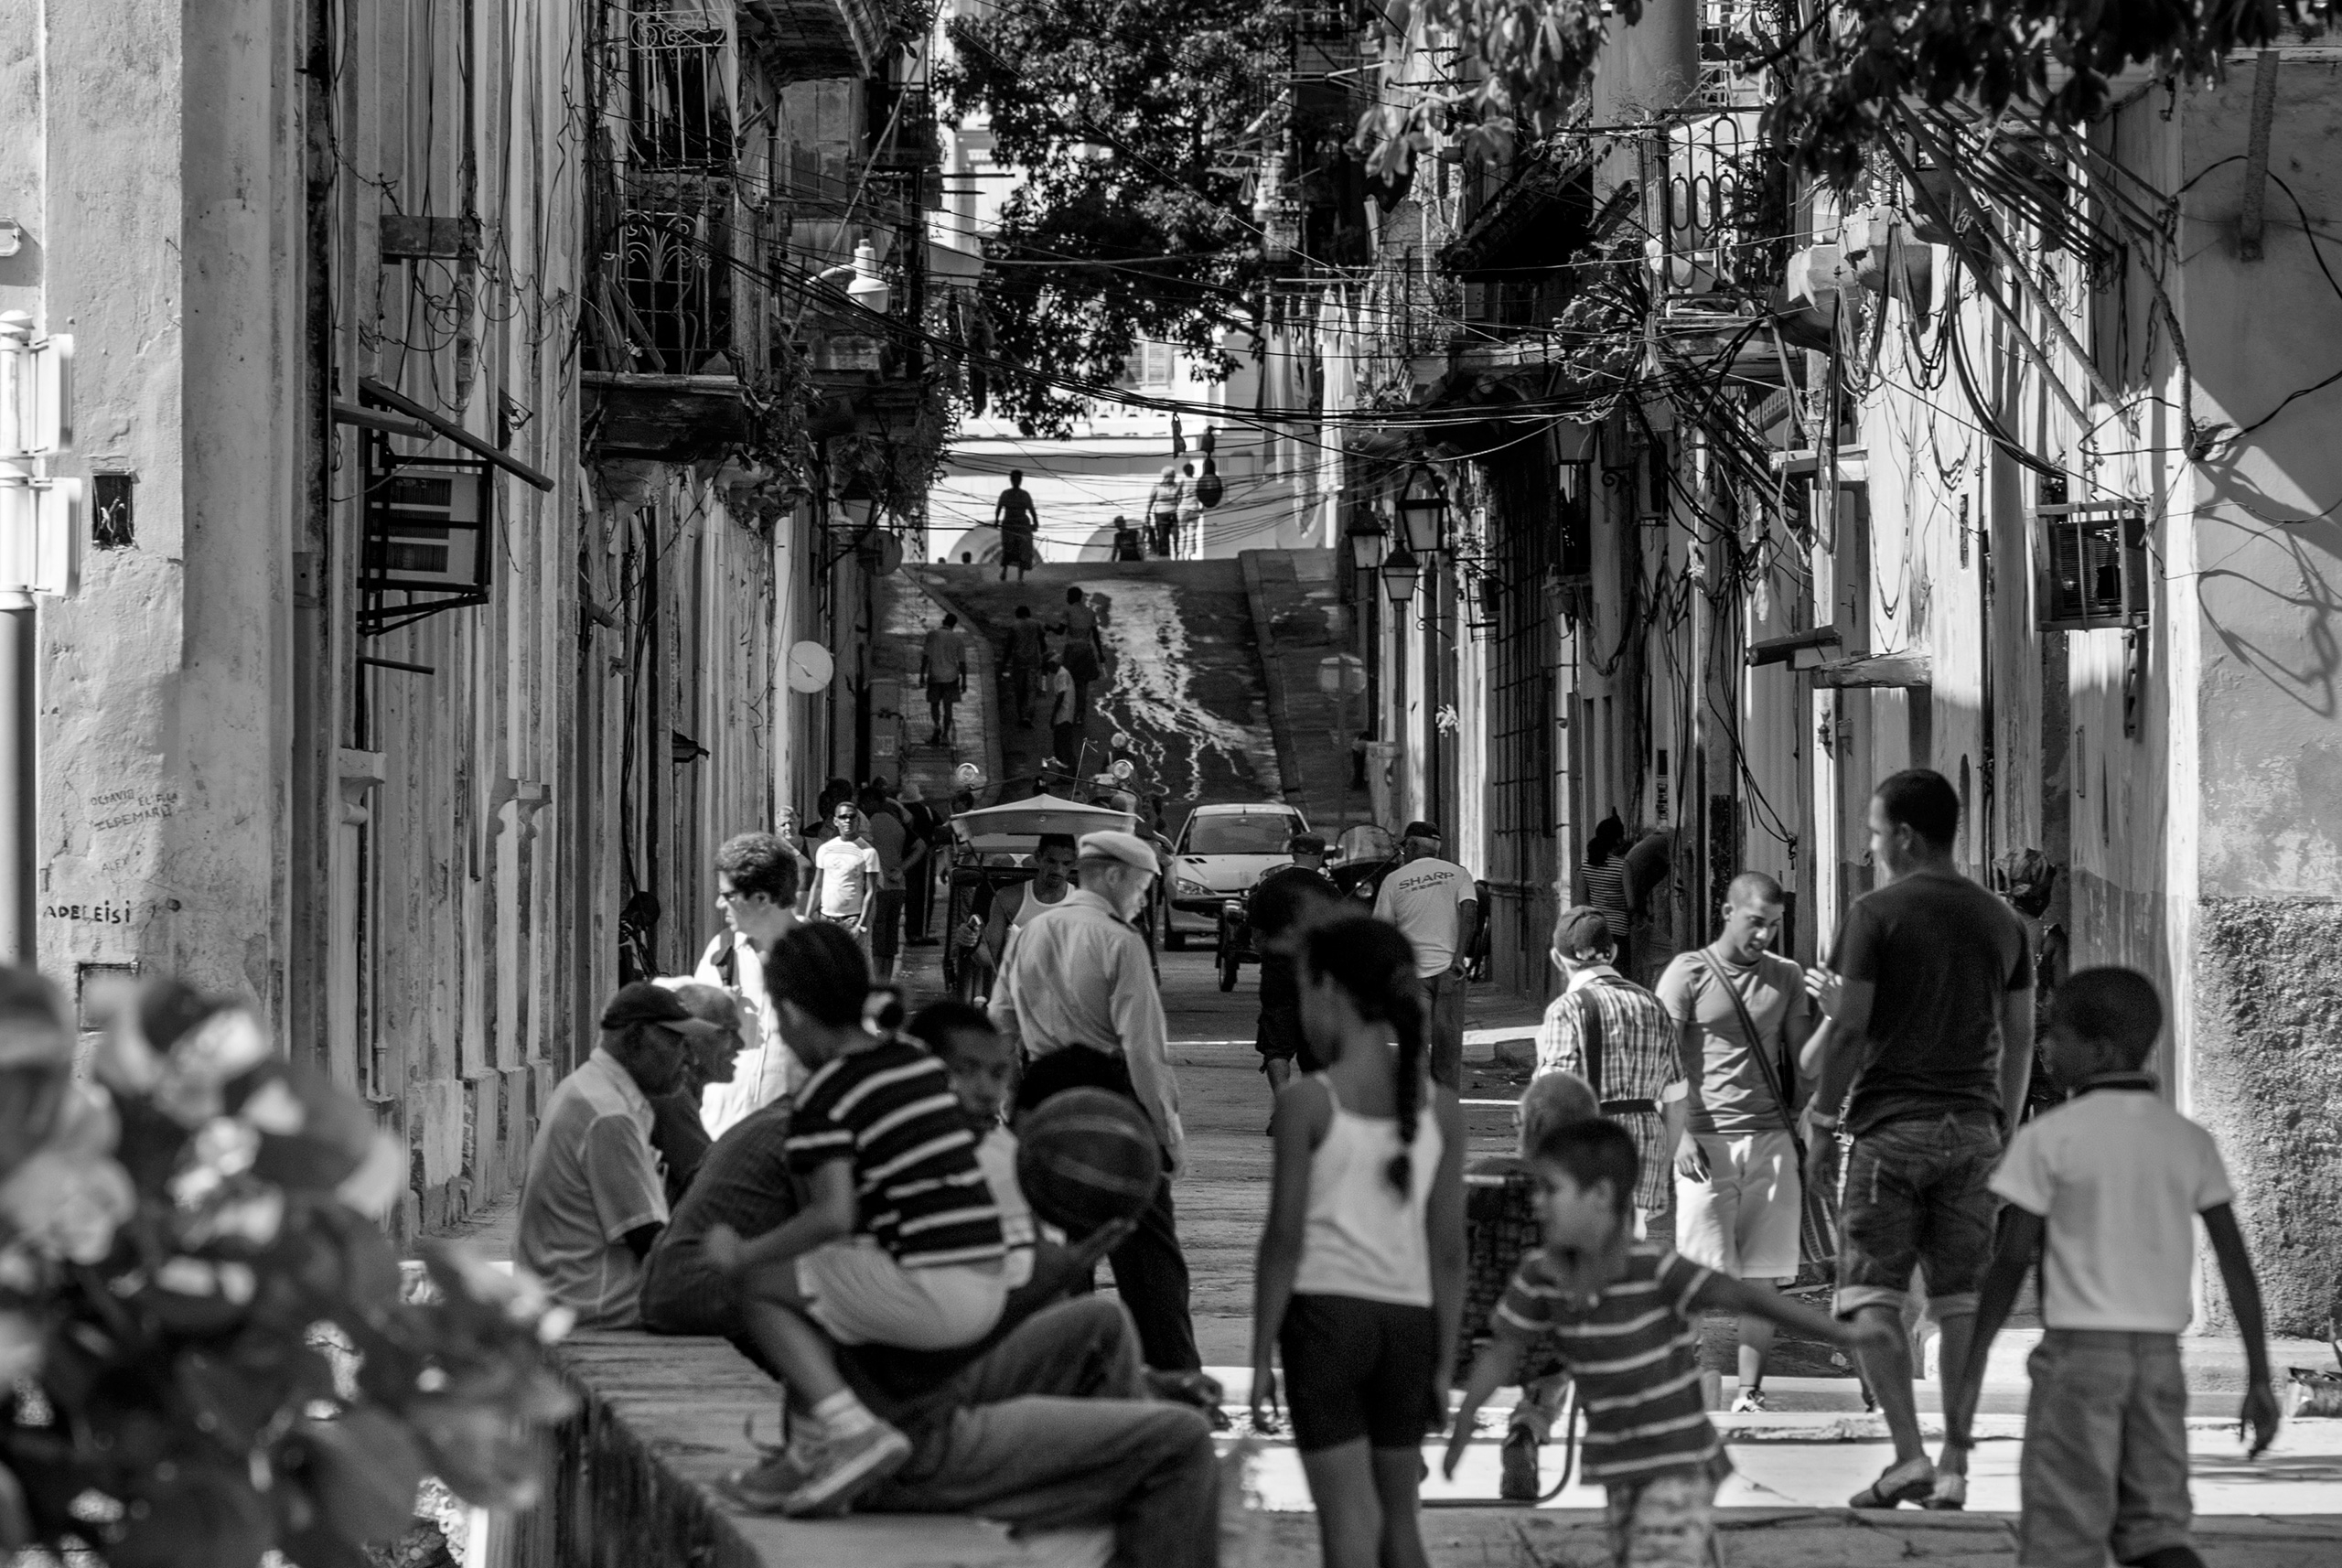 work side street life - Habana, Cuba - christofkessemeier | ello